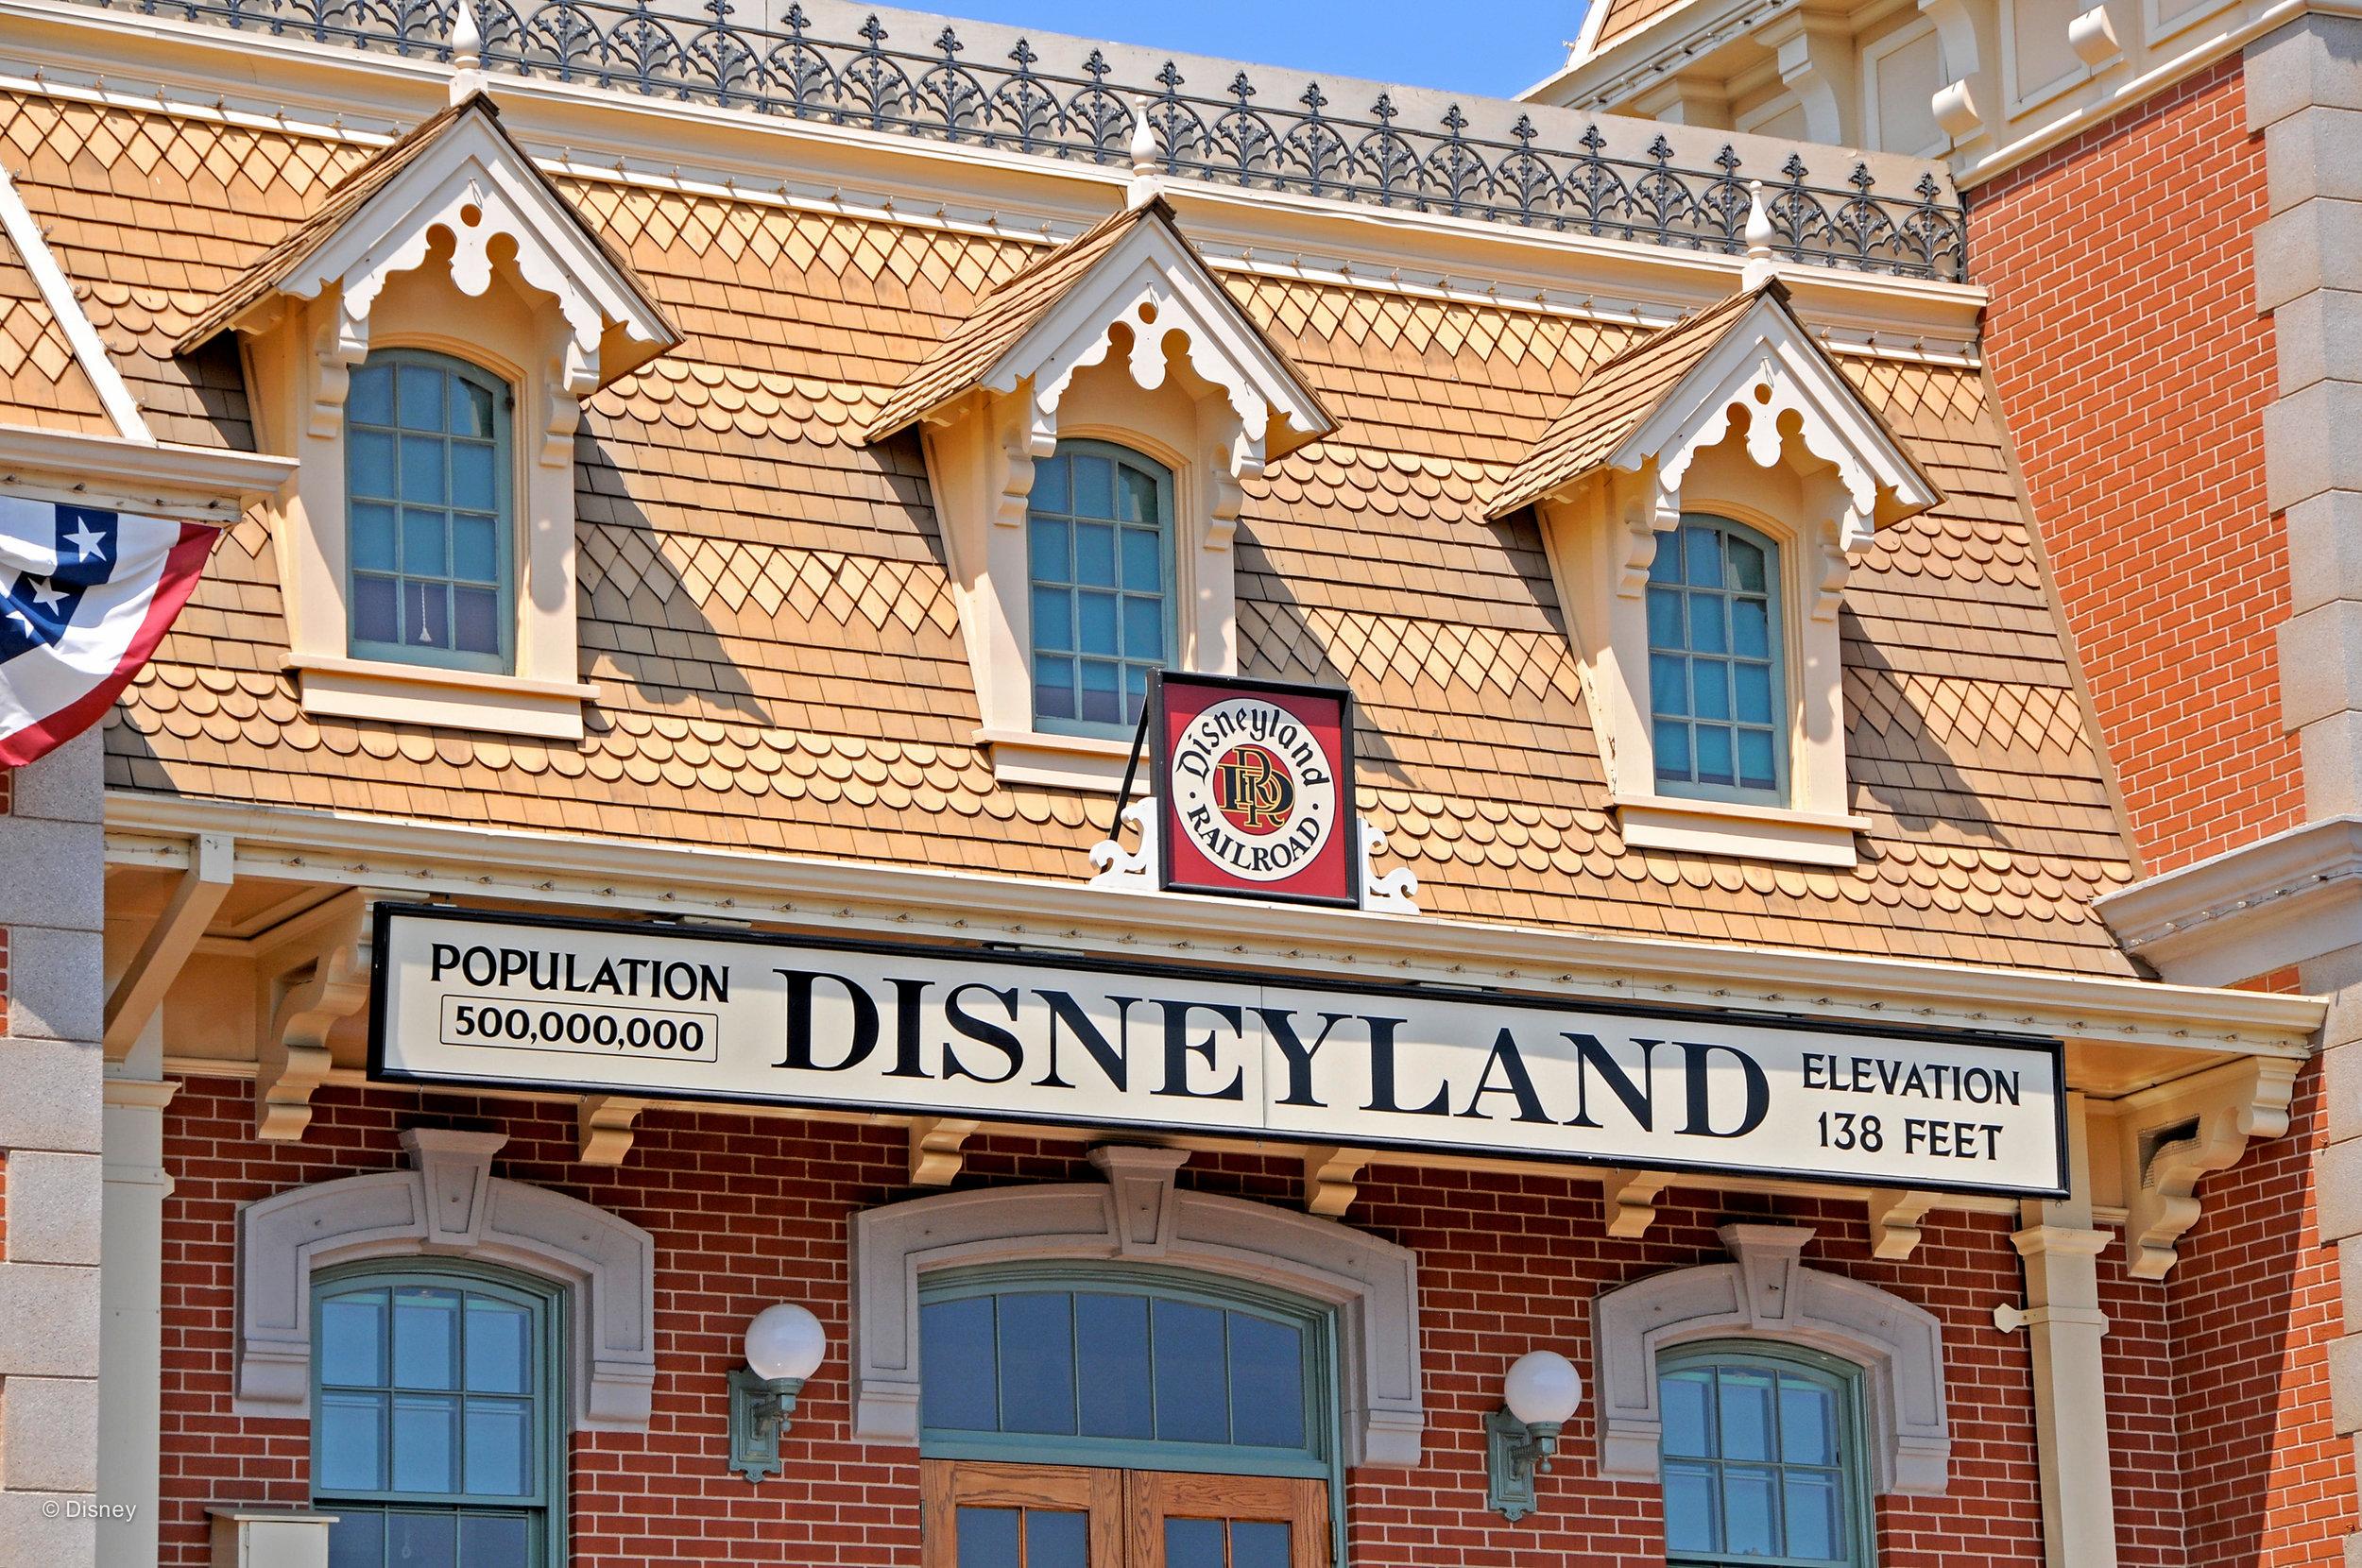 Attraction #2: The Disneyland Railroad